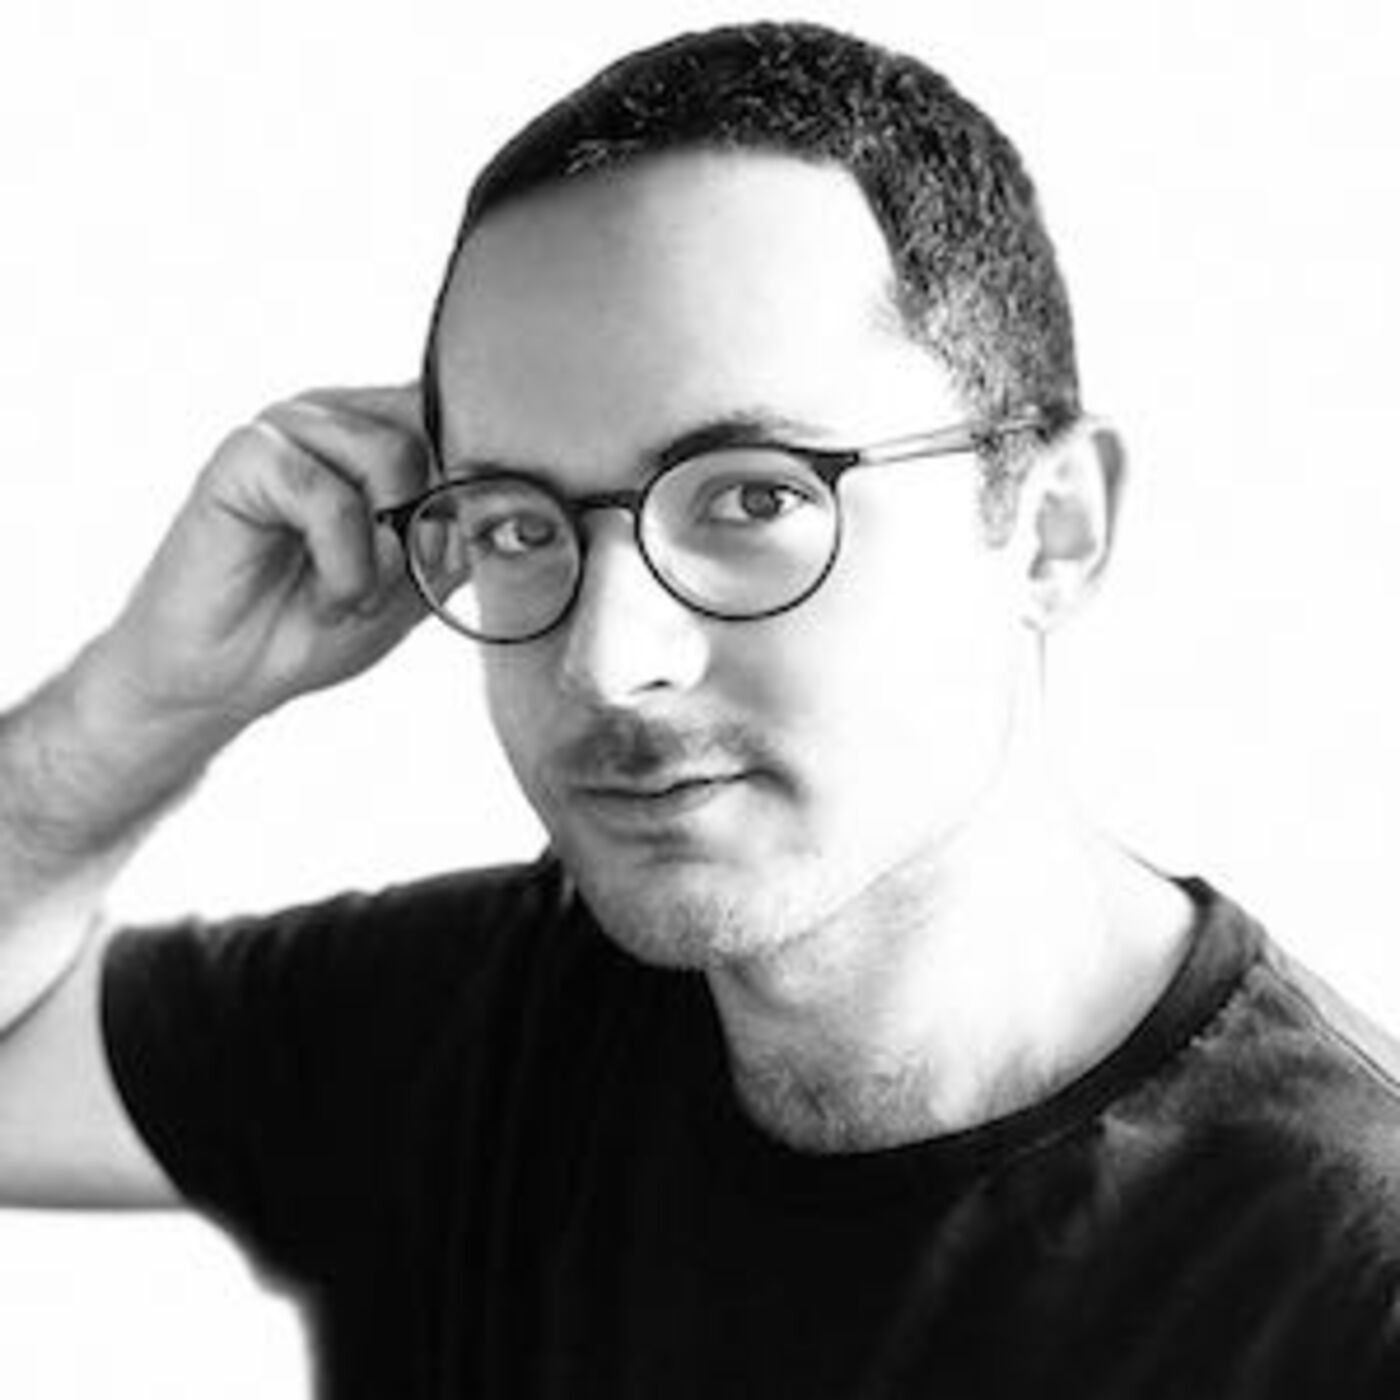 Armando in Wonderland: Illustrator Armando Veve